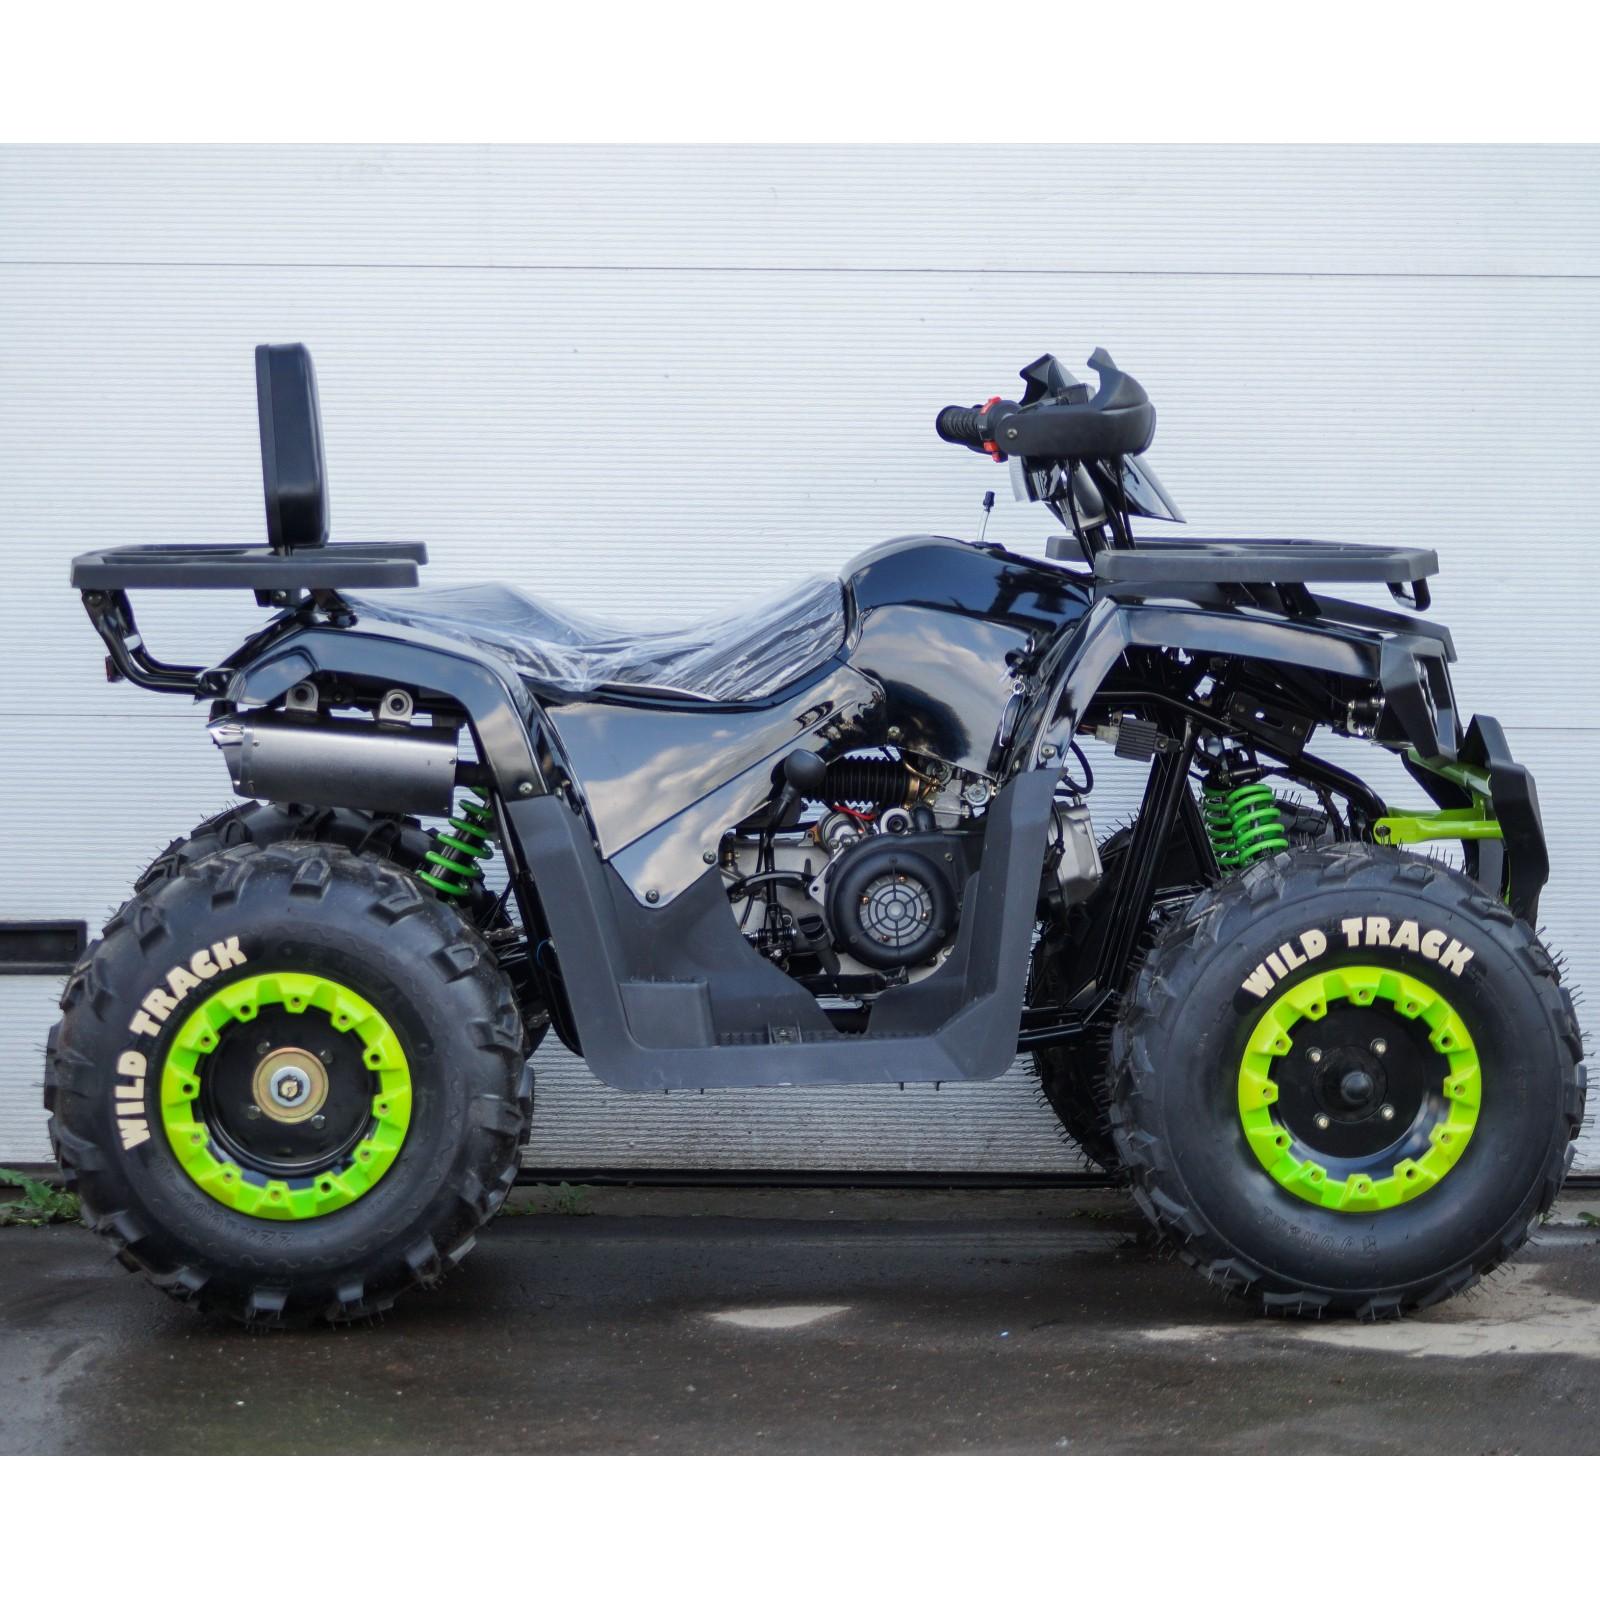 Квадроцикл Stalker-200 WILD TRACK LUX